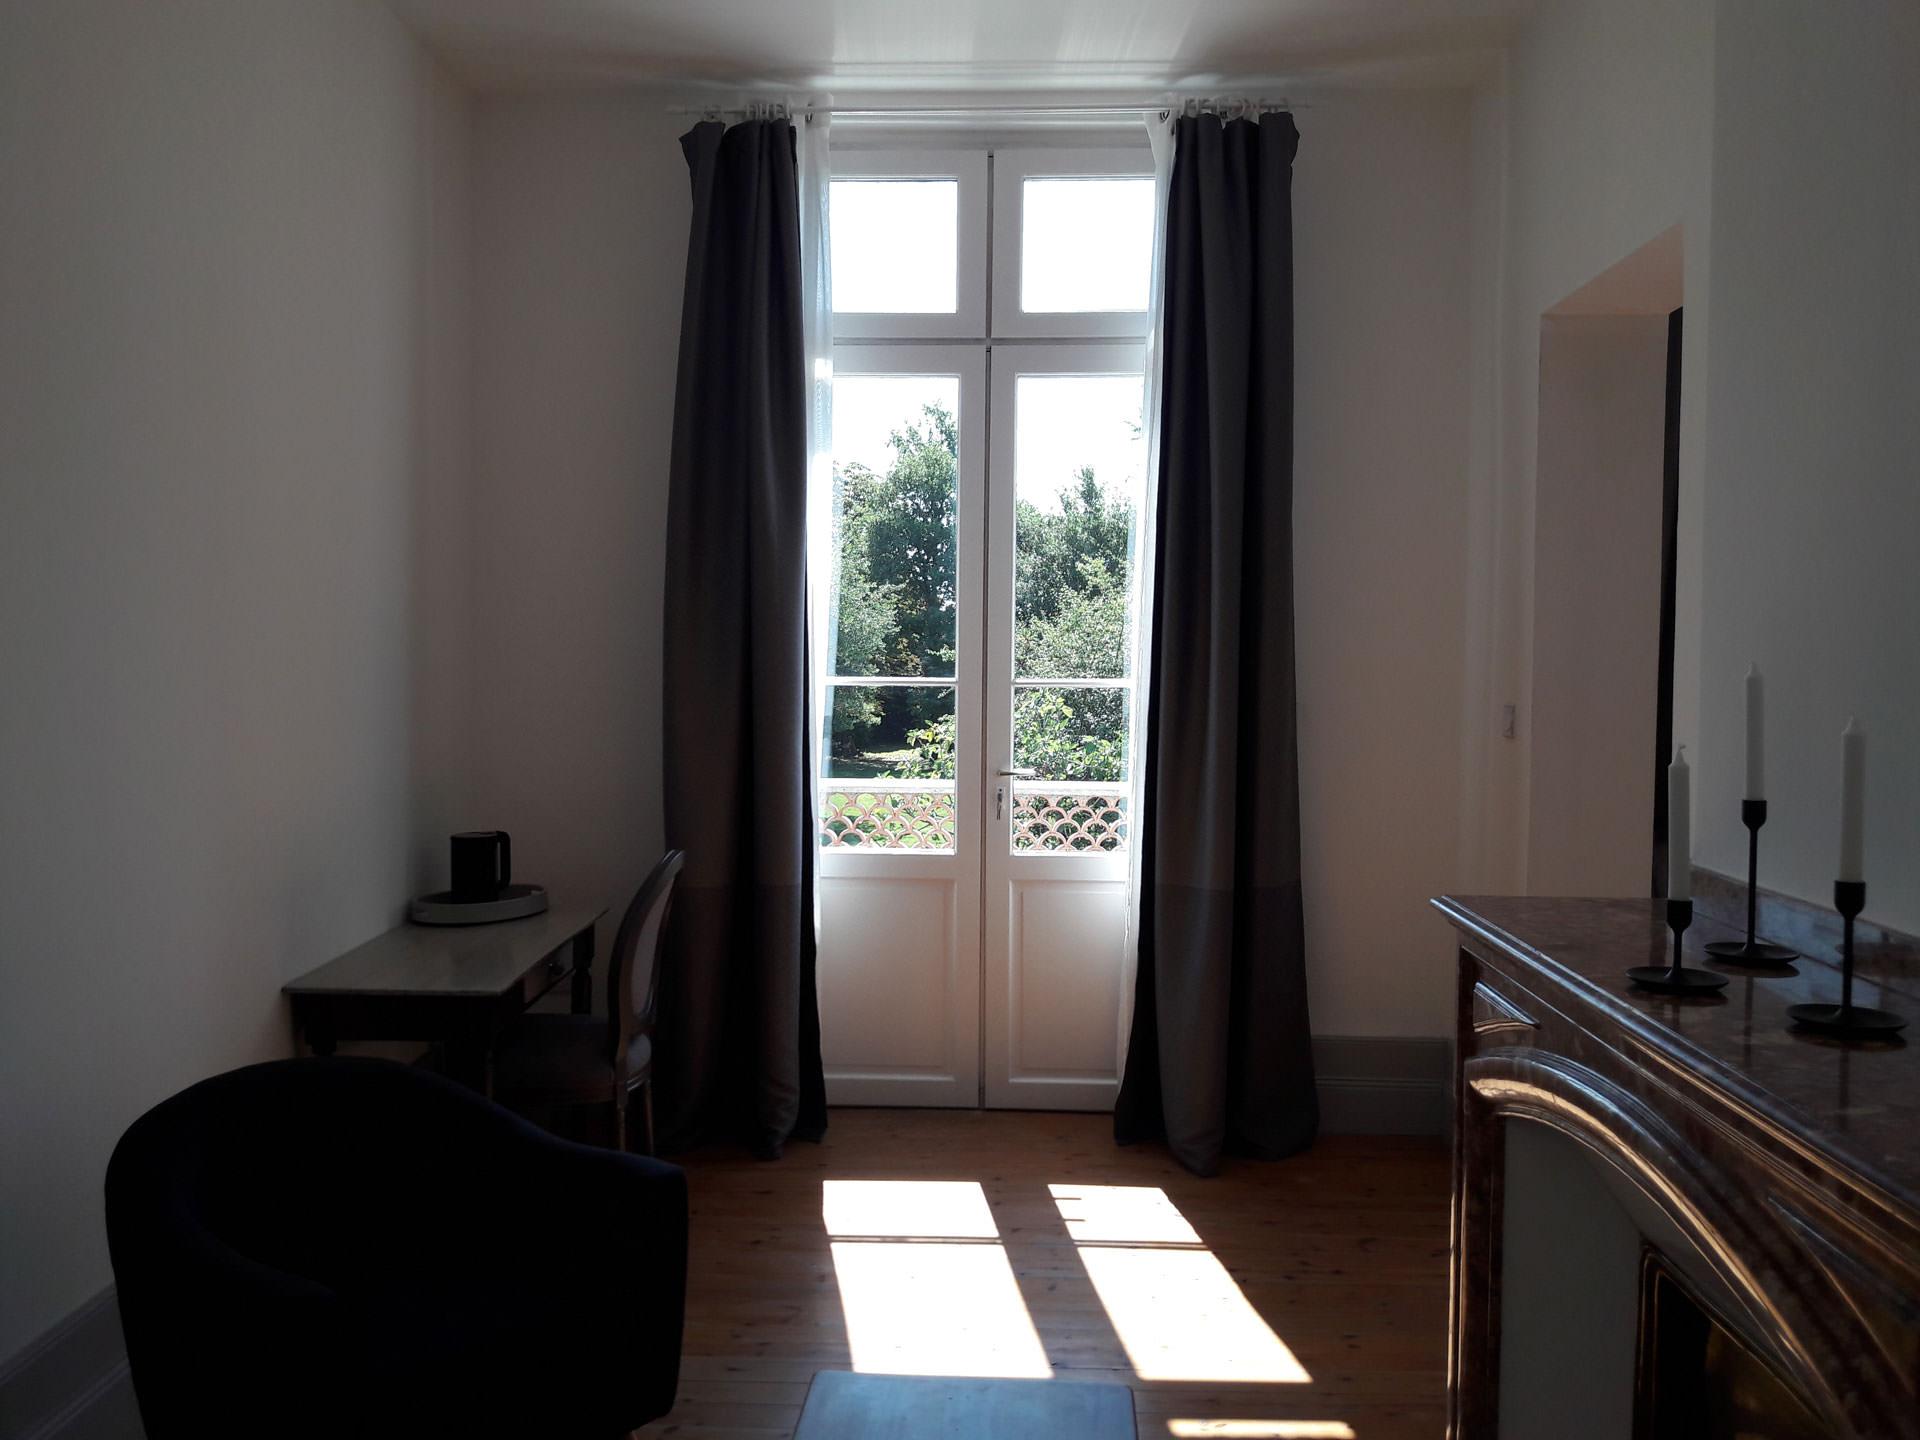 Chambres d'hôtes Tarn-et-Garonne